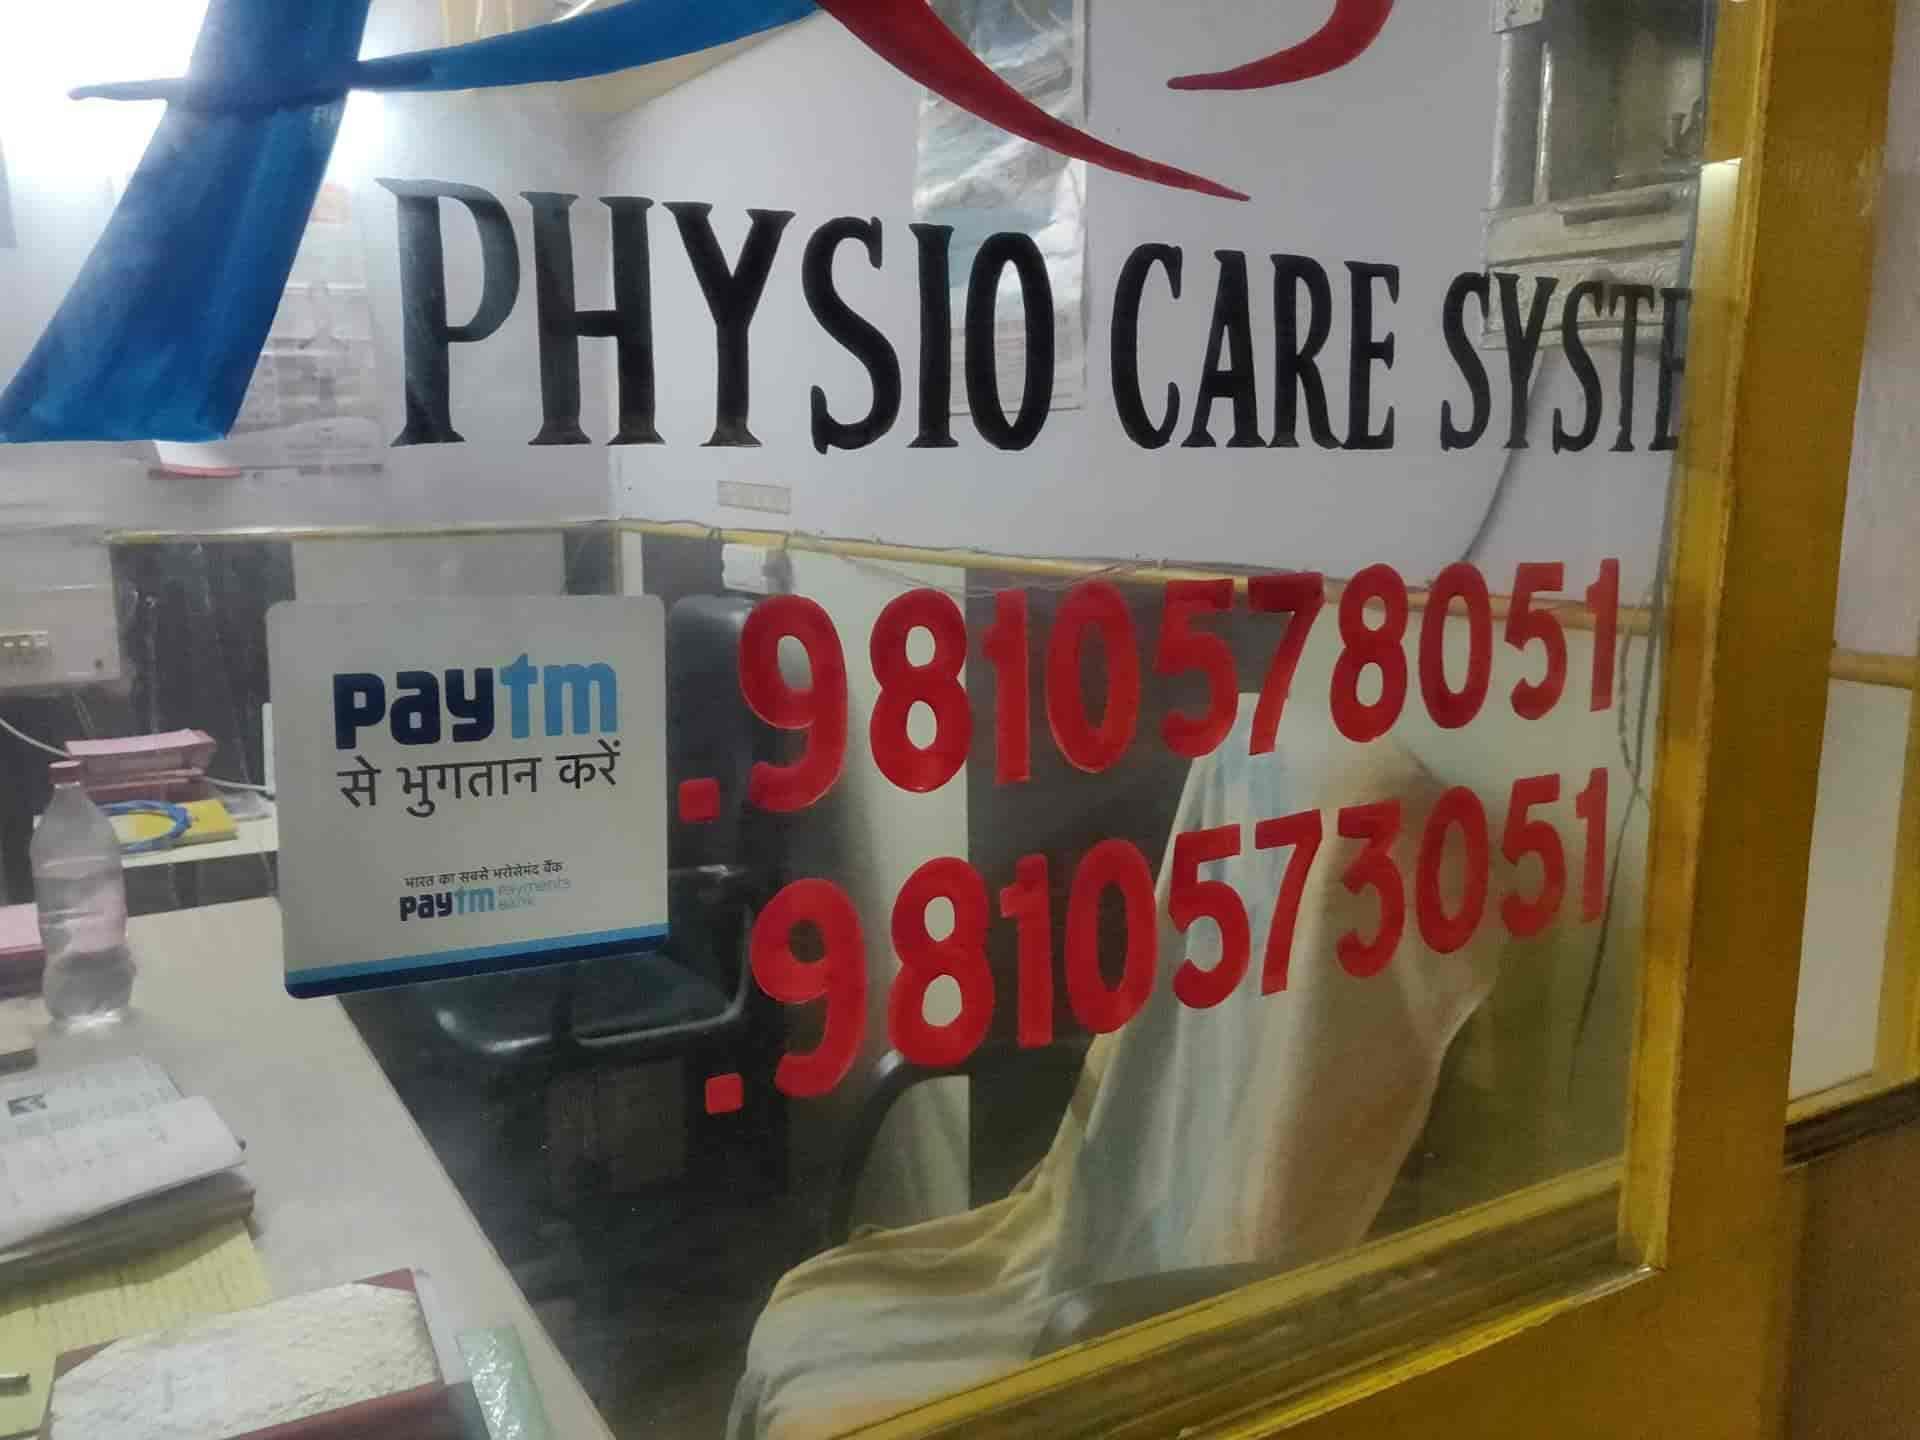 Physio Care System, Vinod Nagar West - Medical Equipment